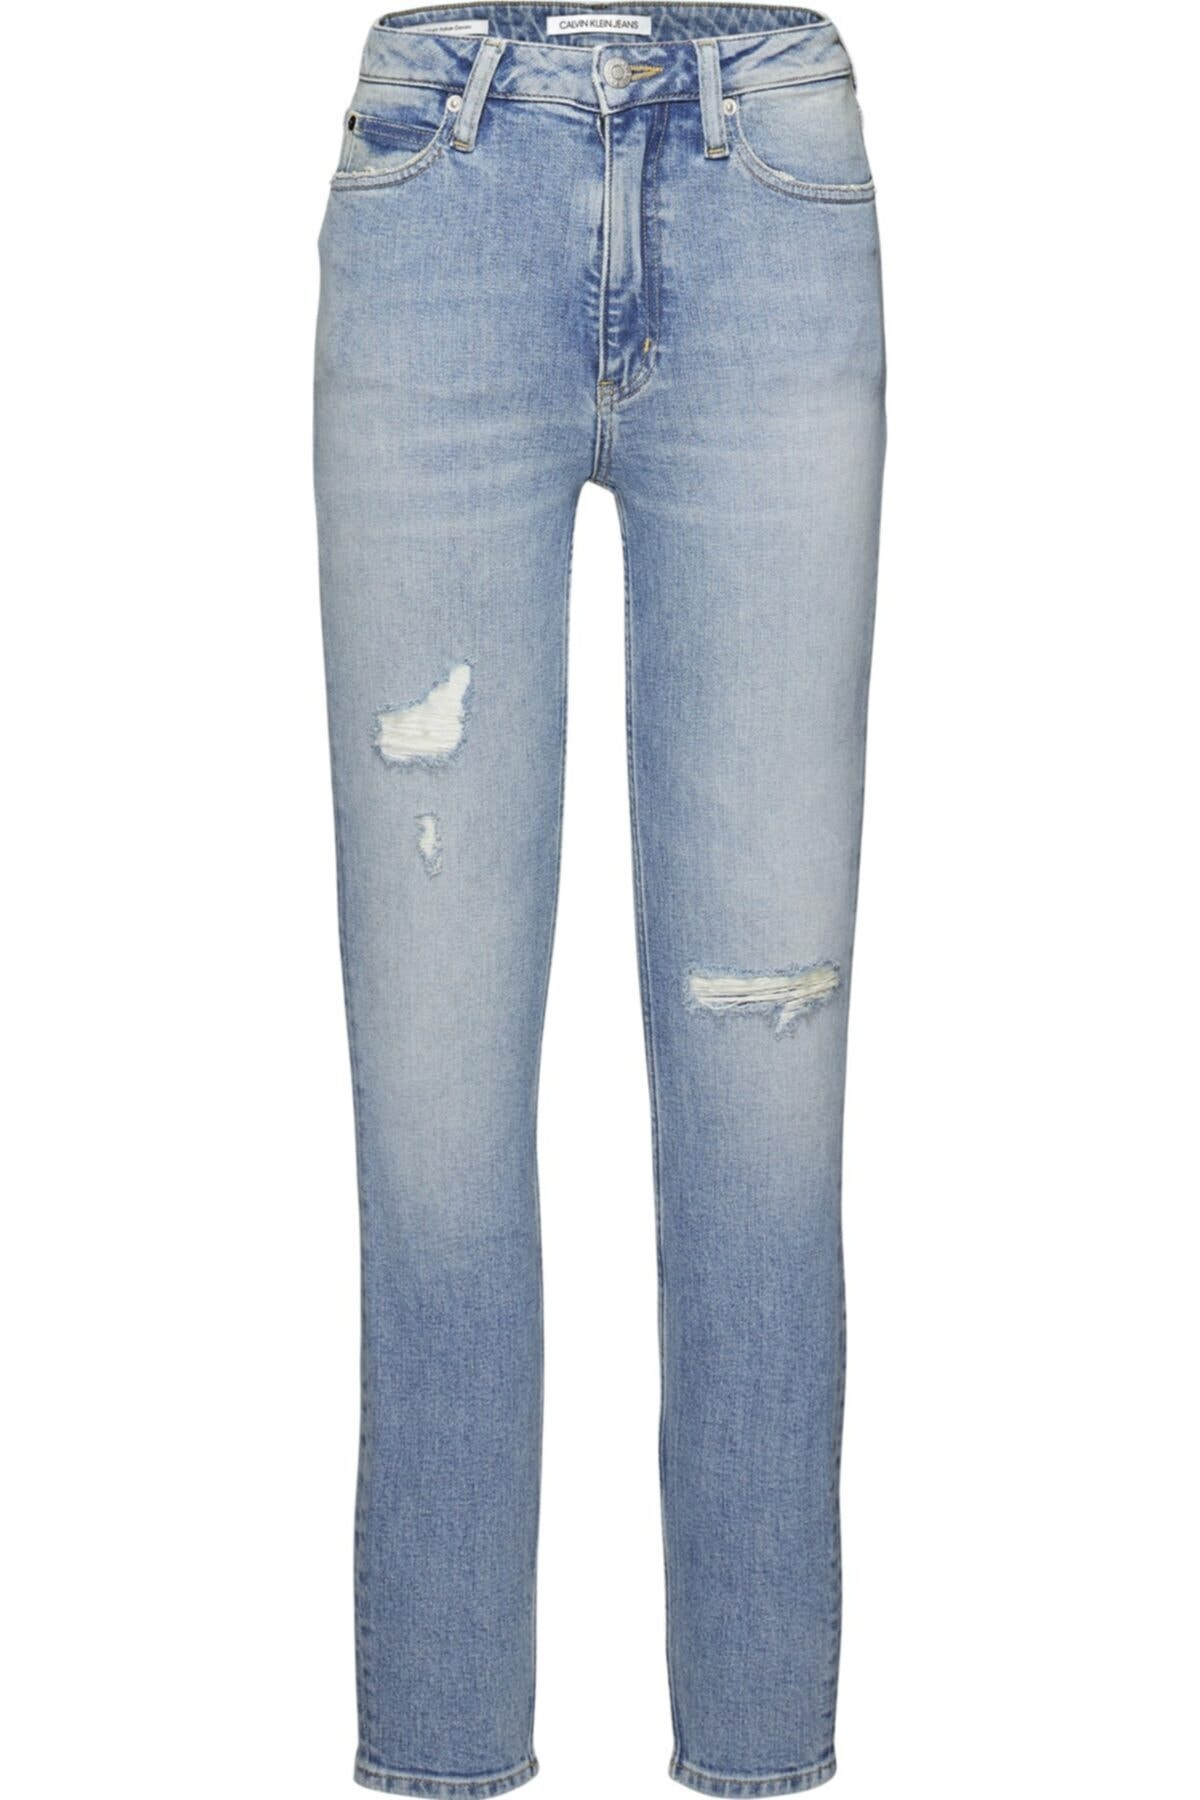 Calvin Klein J20j207627 Unisex Mavi  Pantolon 1